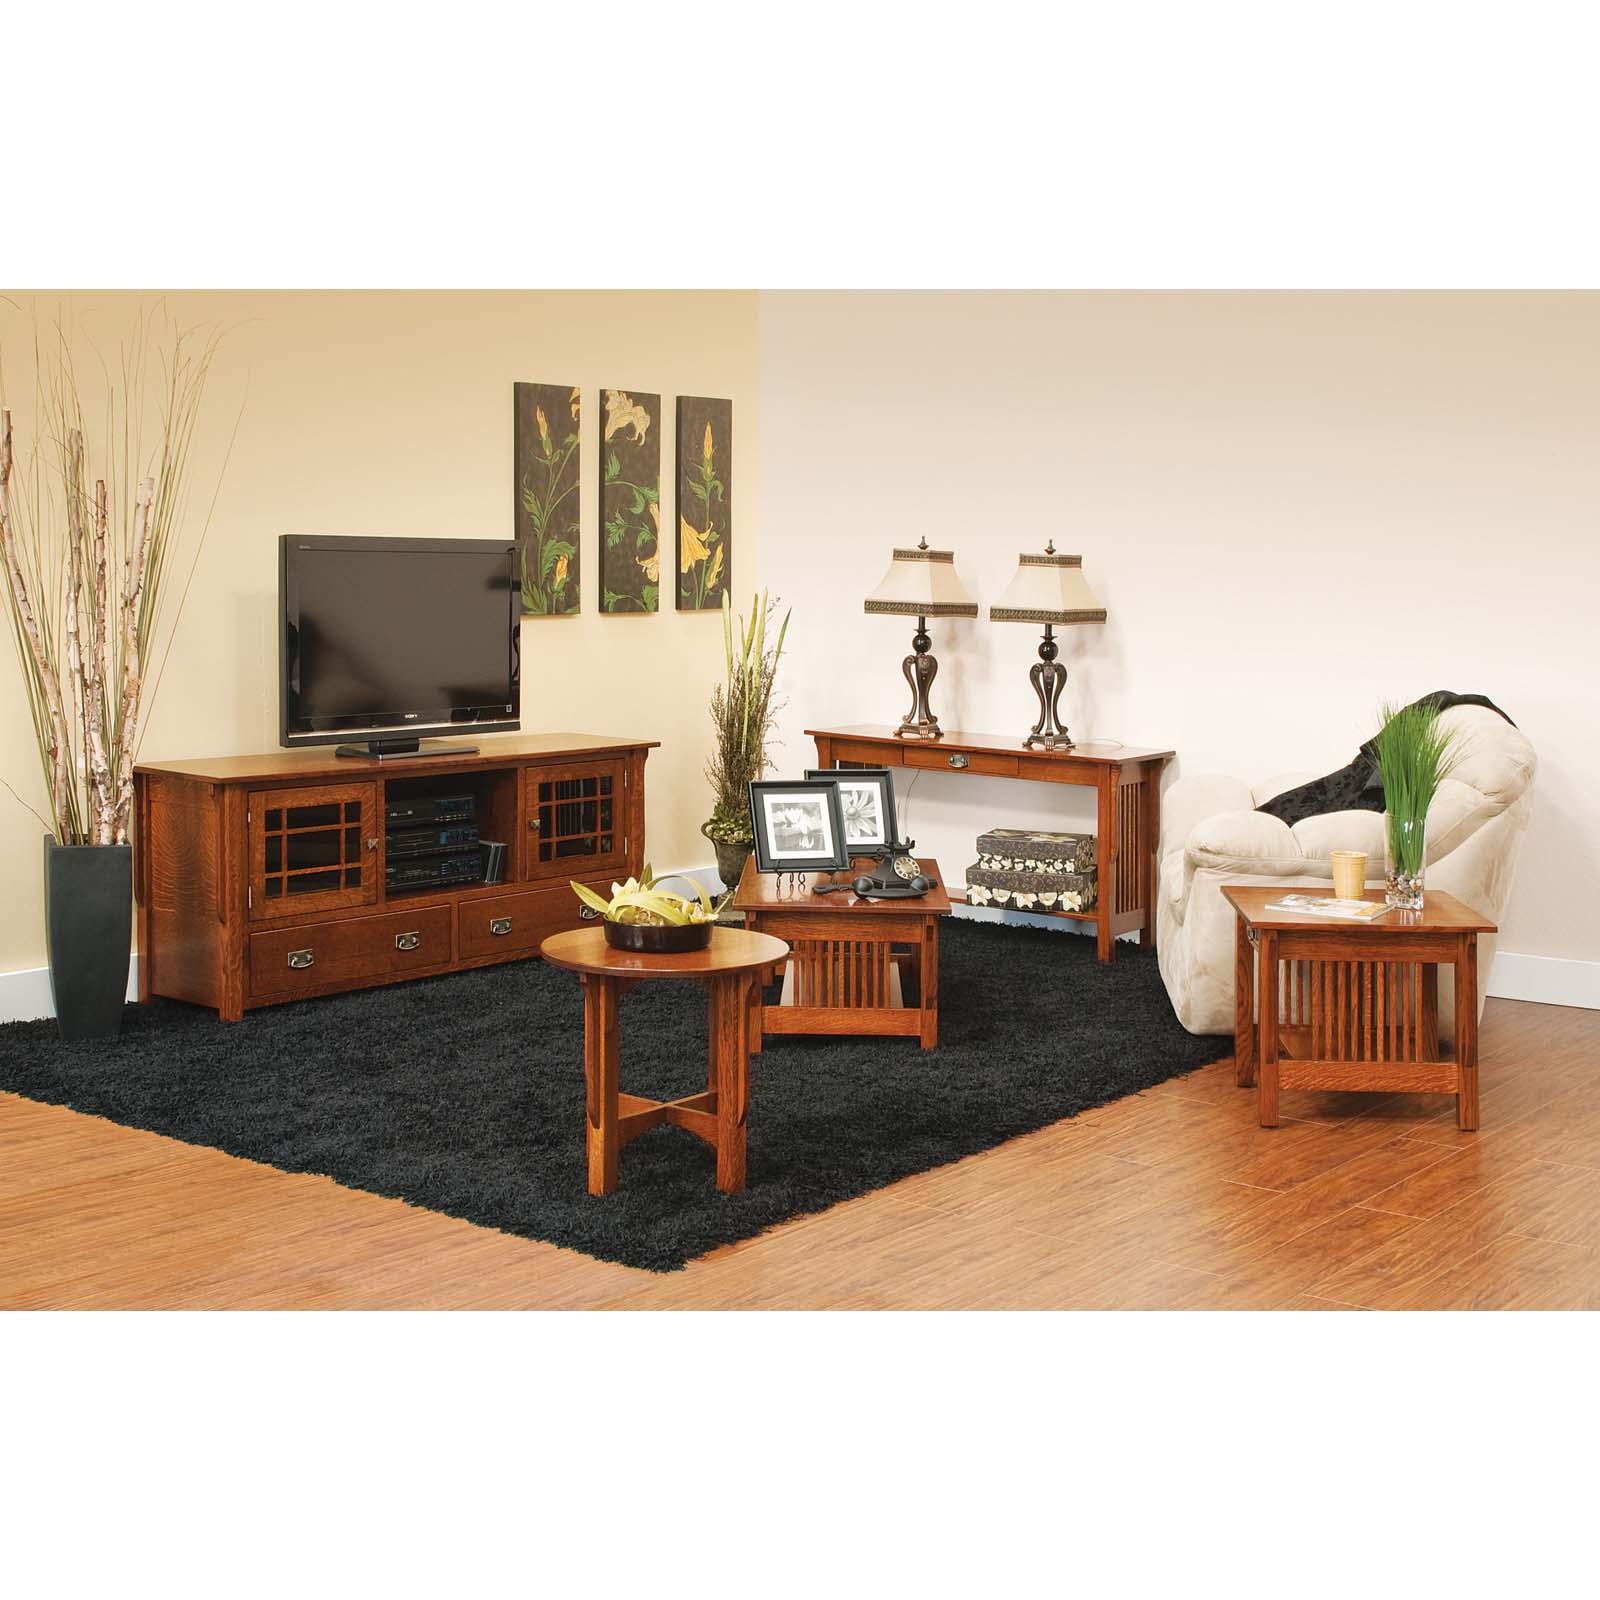 Savanah Living Room Set by Fusion Designs | Stewart Roth ...